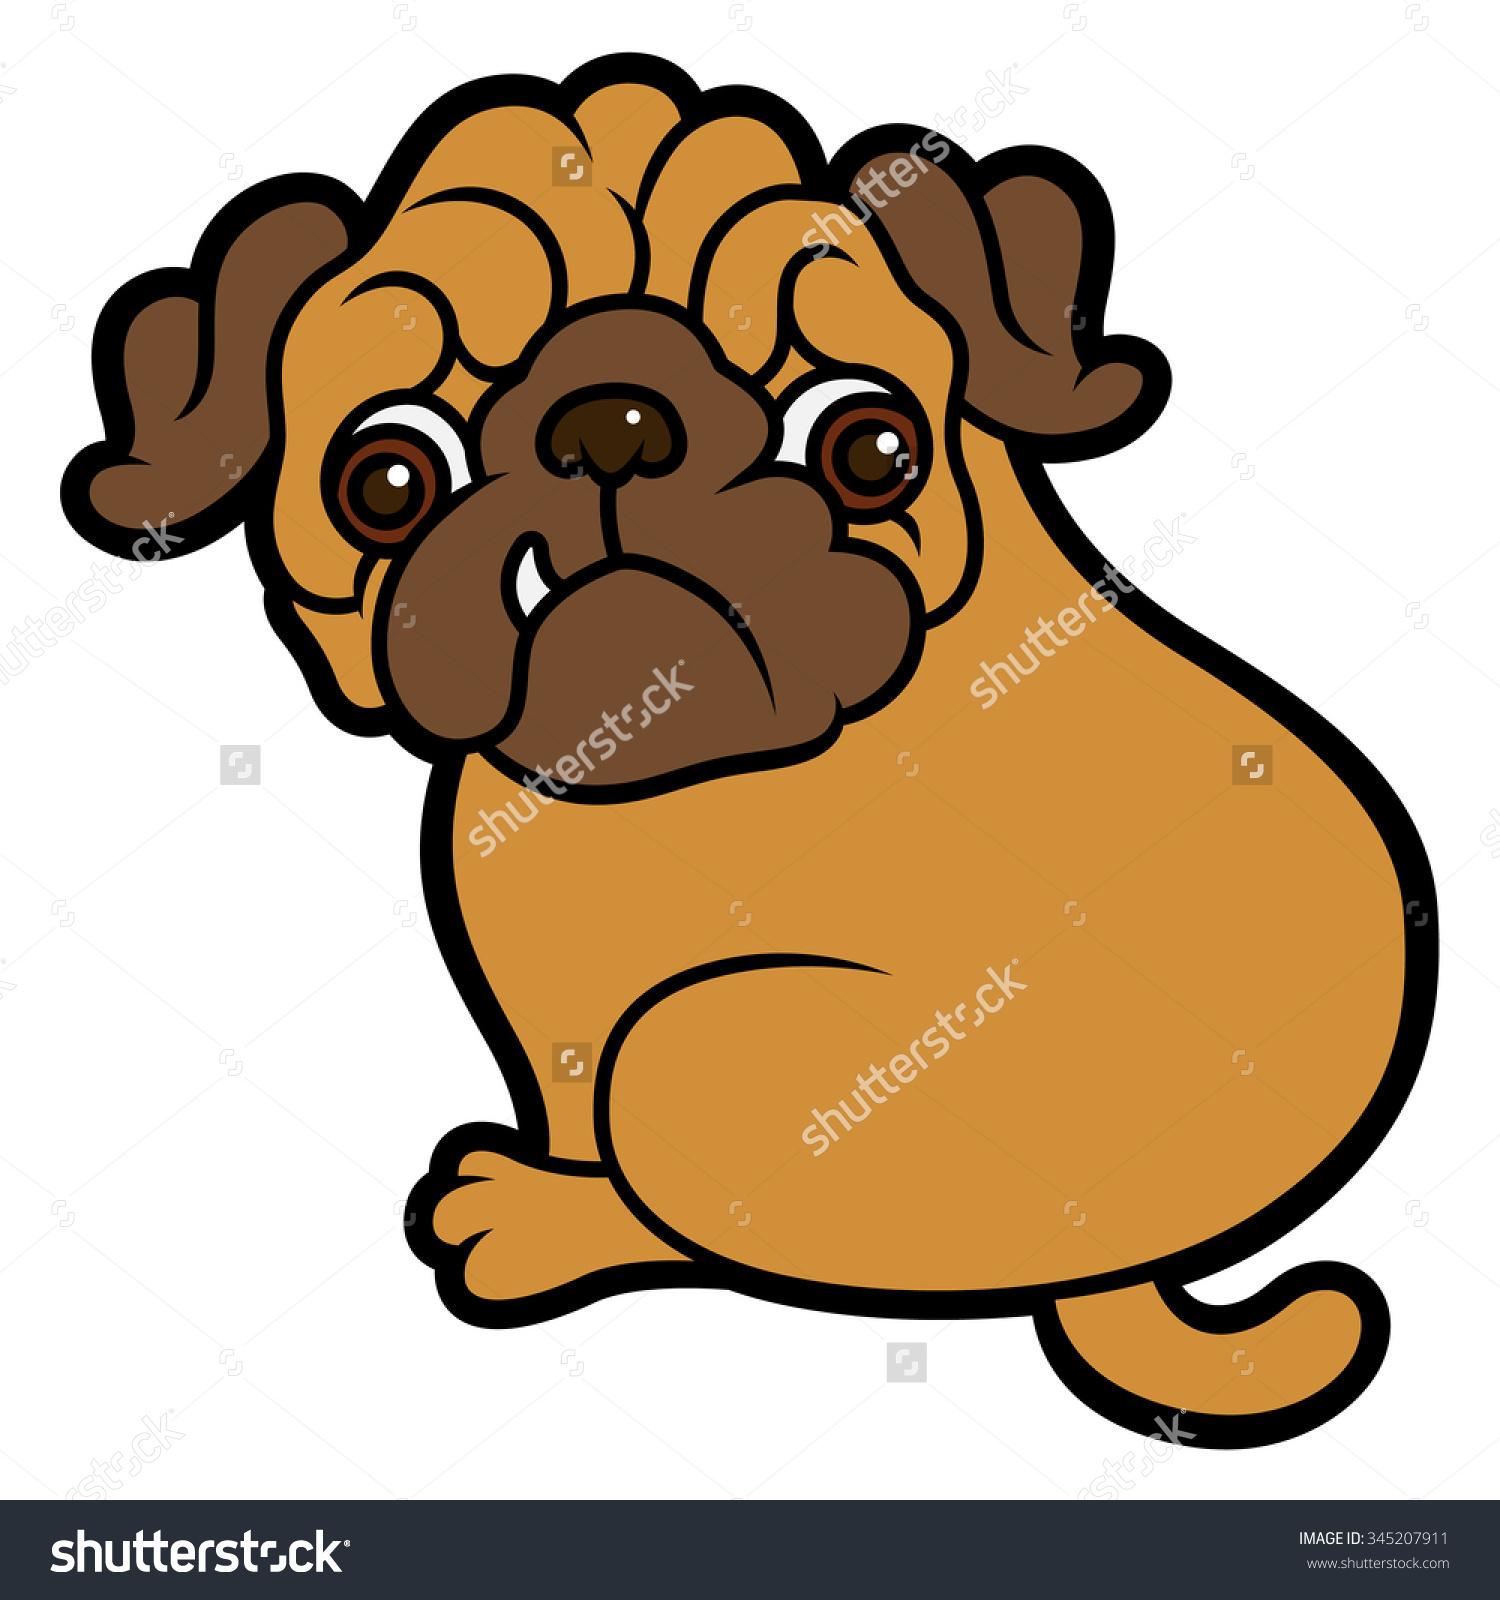 Clipart Purebred Dog Transparent.